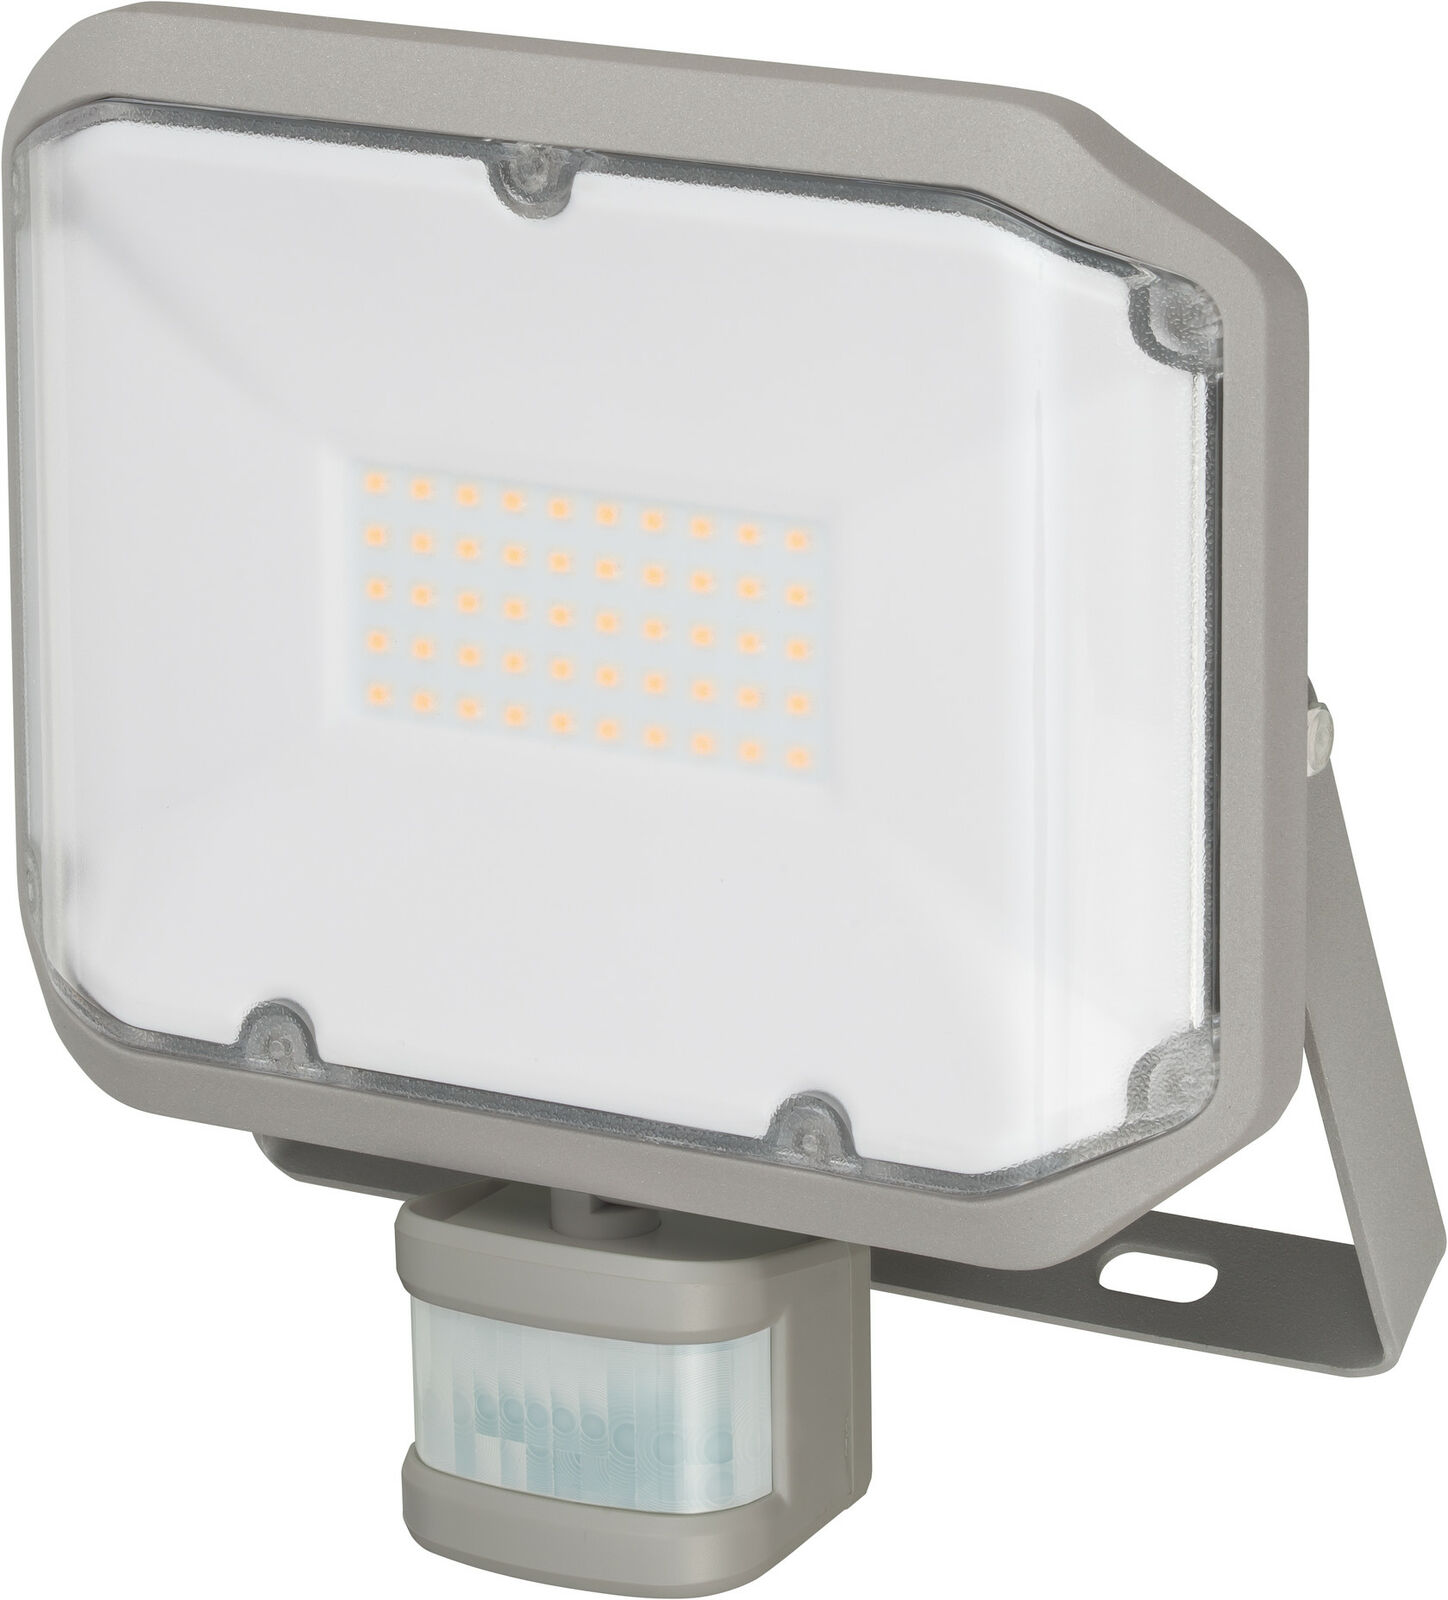 Brennenstuhl LED Strahler Alcinda 3000 P - 30 W, grau, mit Bewegungsmelder